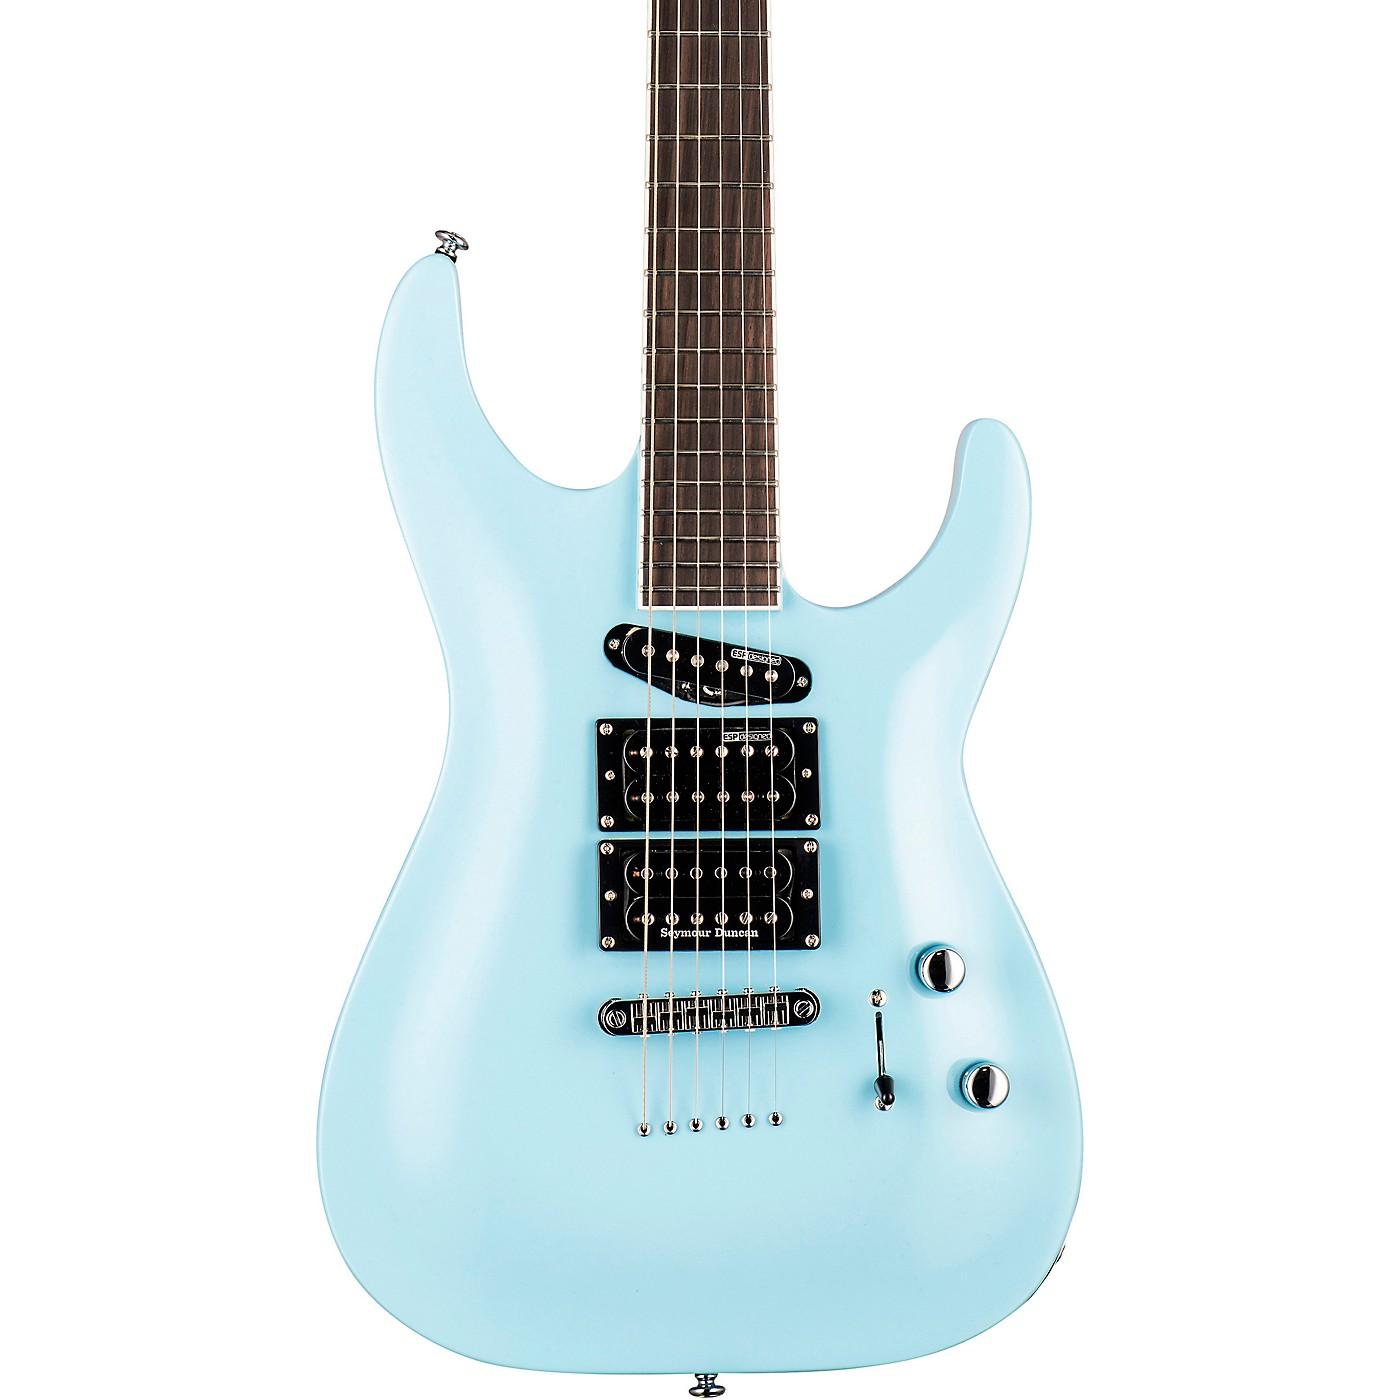 ESP LTD Stef Carpenter SC-20 Electric Guitar thumbnail